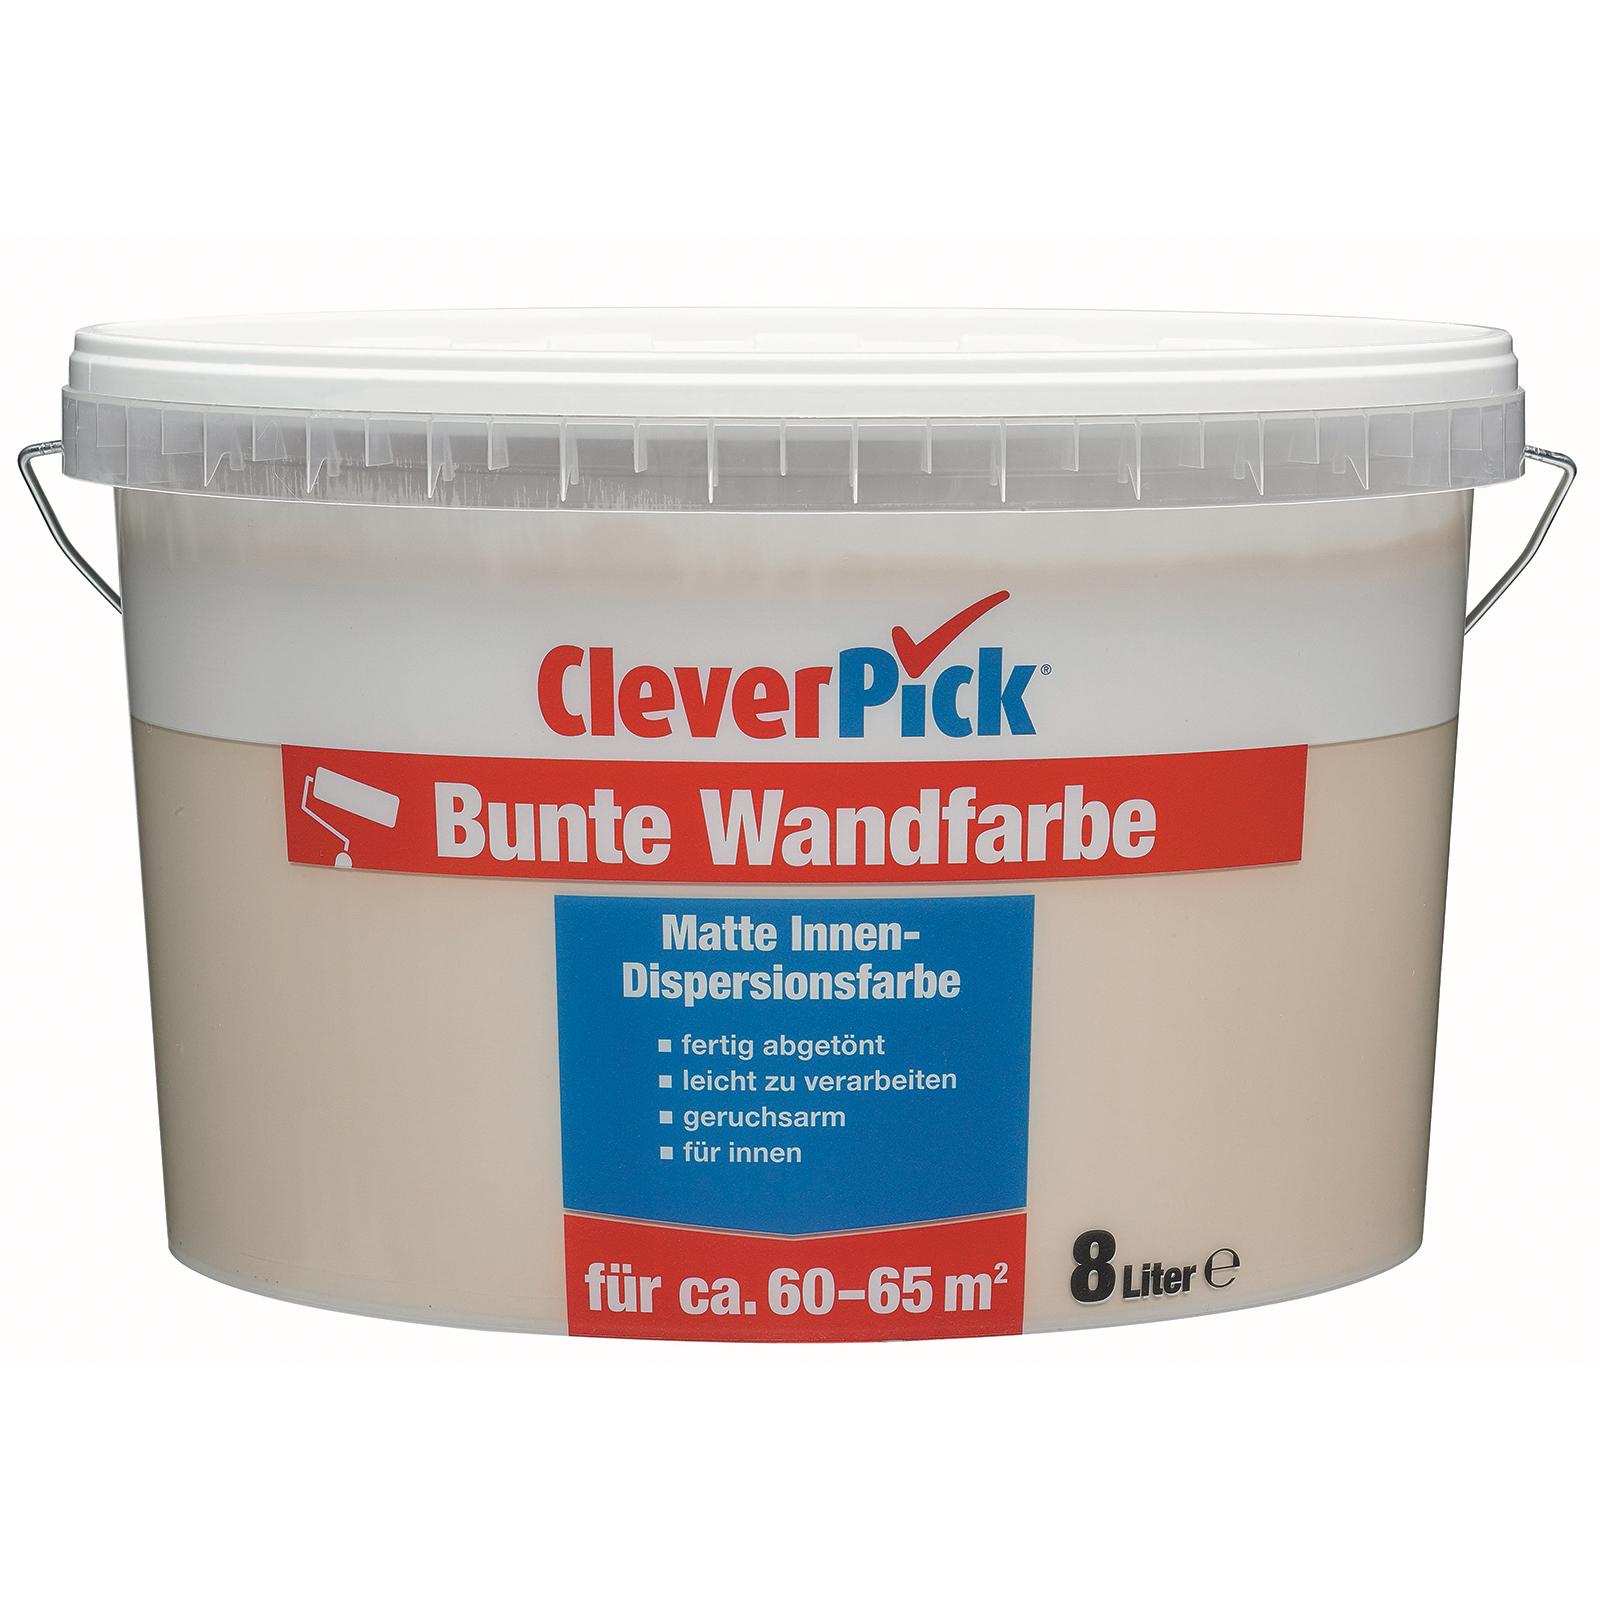 Cleverpick Bunte Wandfarbe Cappuccino 8 Liter Online Bei Roller Kaufen